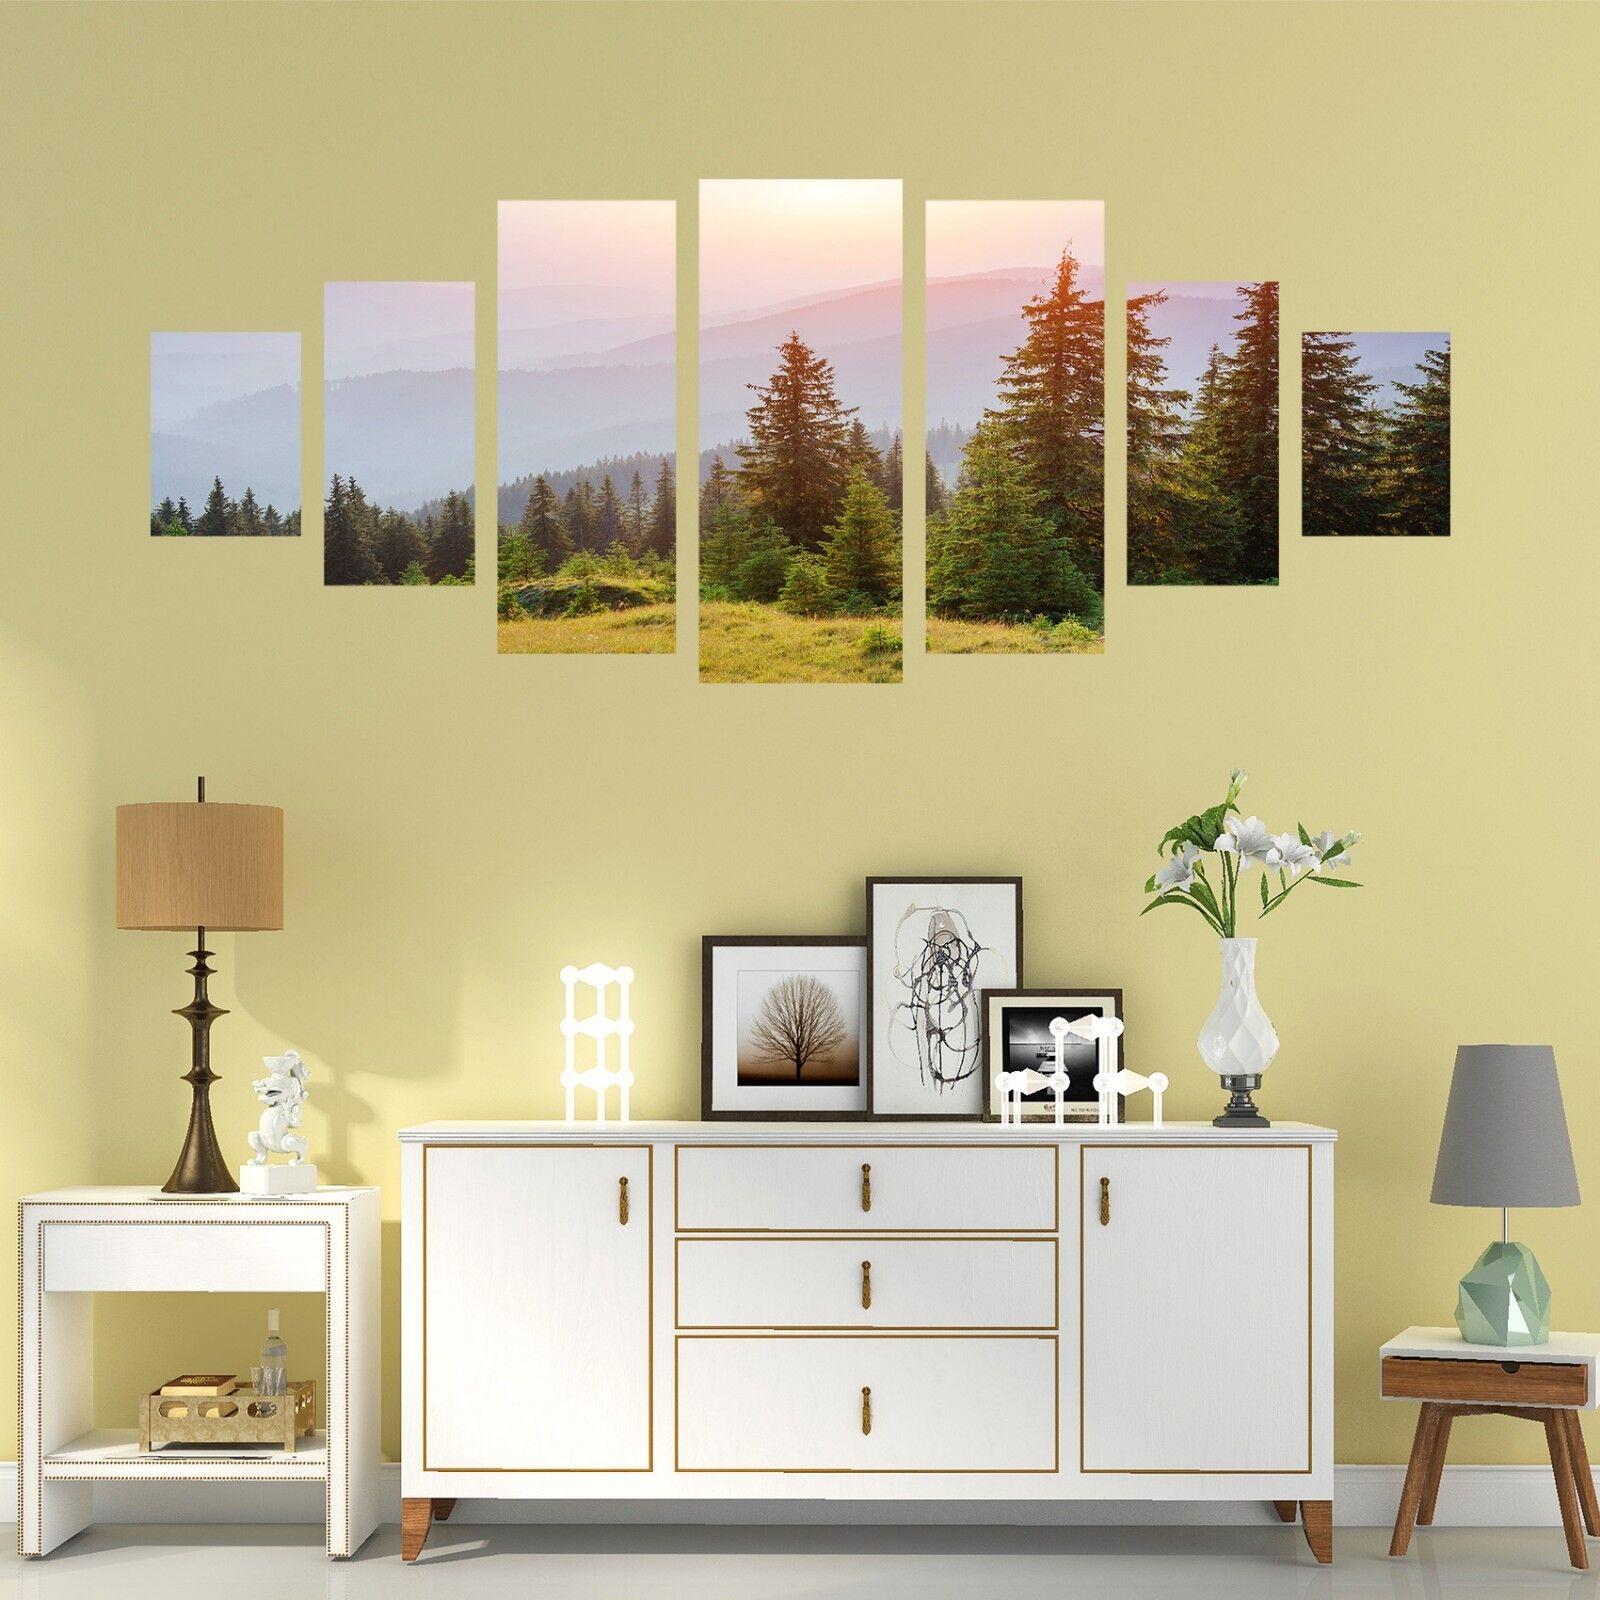 3D Sunlight Pine 686 Unframed Print Wall Paper Decal Wall Deco Indoor AJ Wall